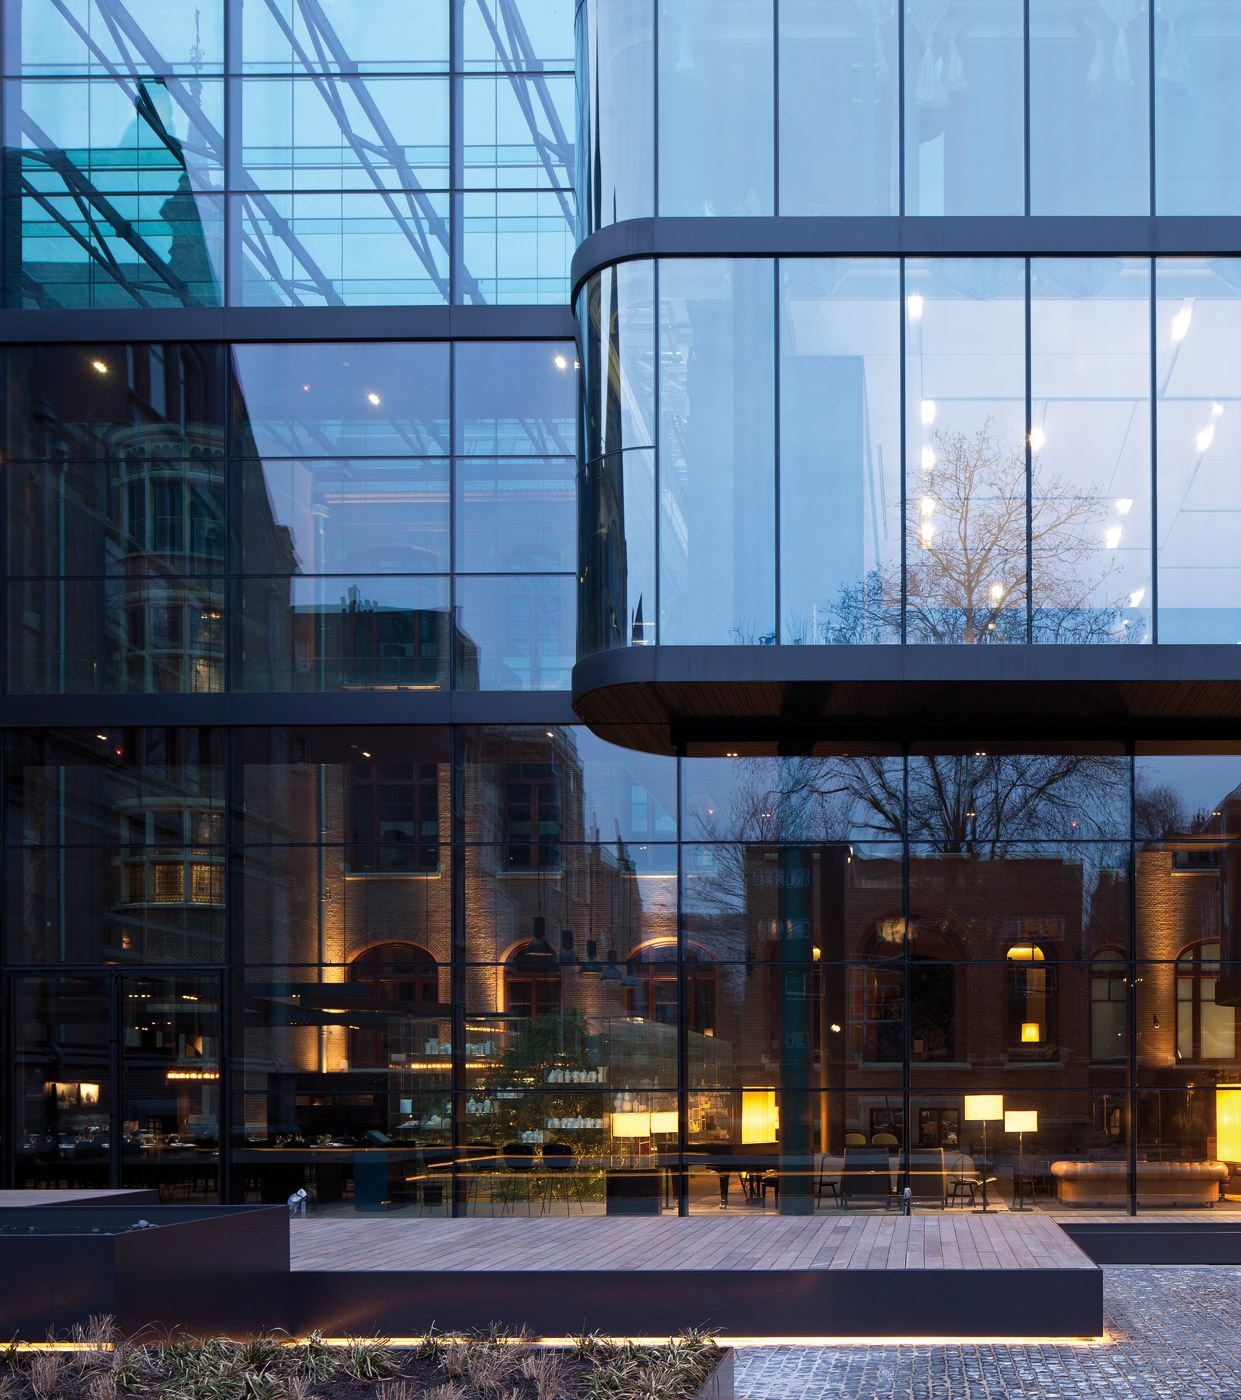 Alrov Conservatorium Hotel In Collaboration With Lissoni